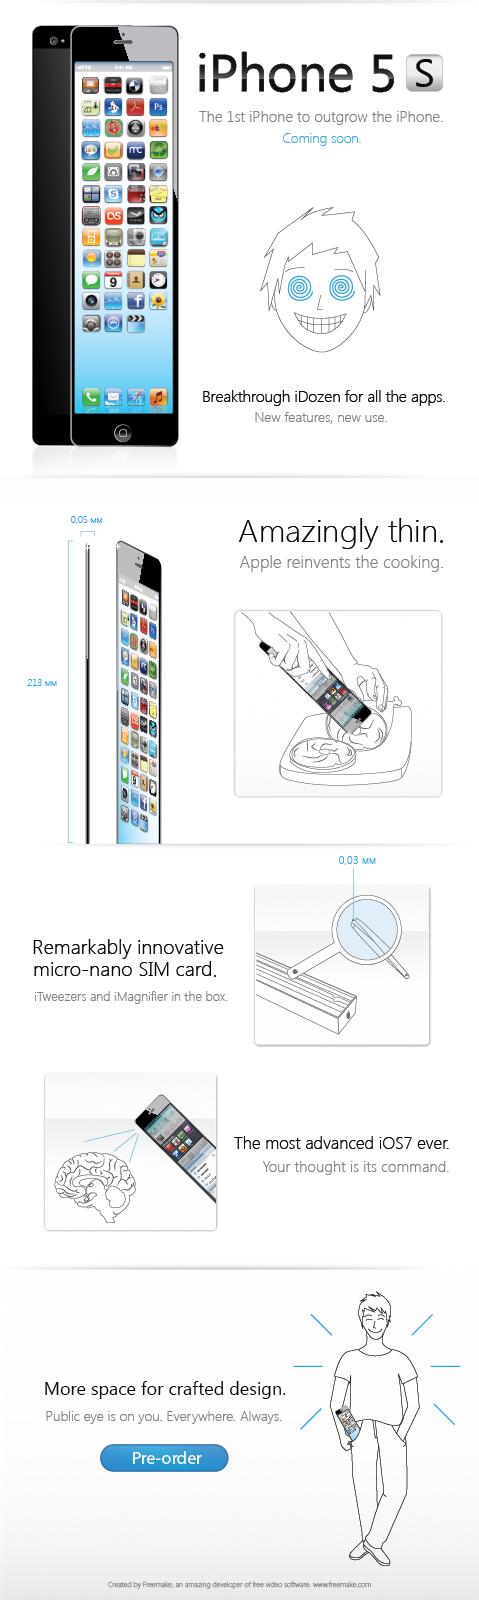 iPhone 5S INFOGRAPHIC